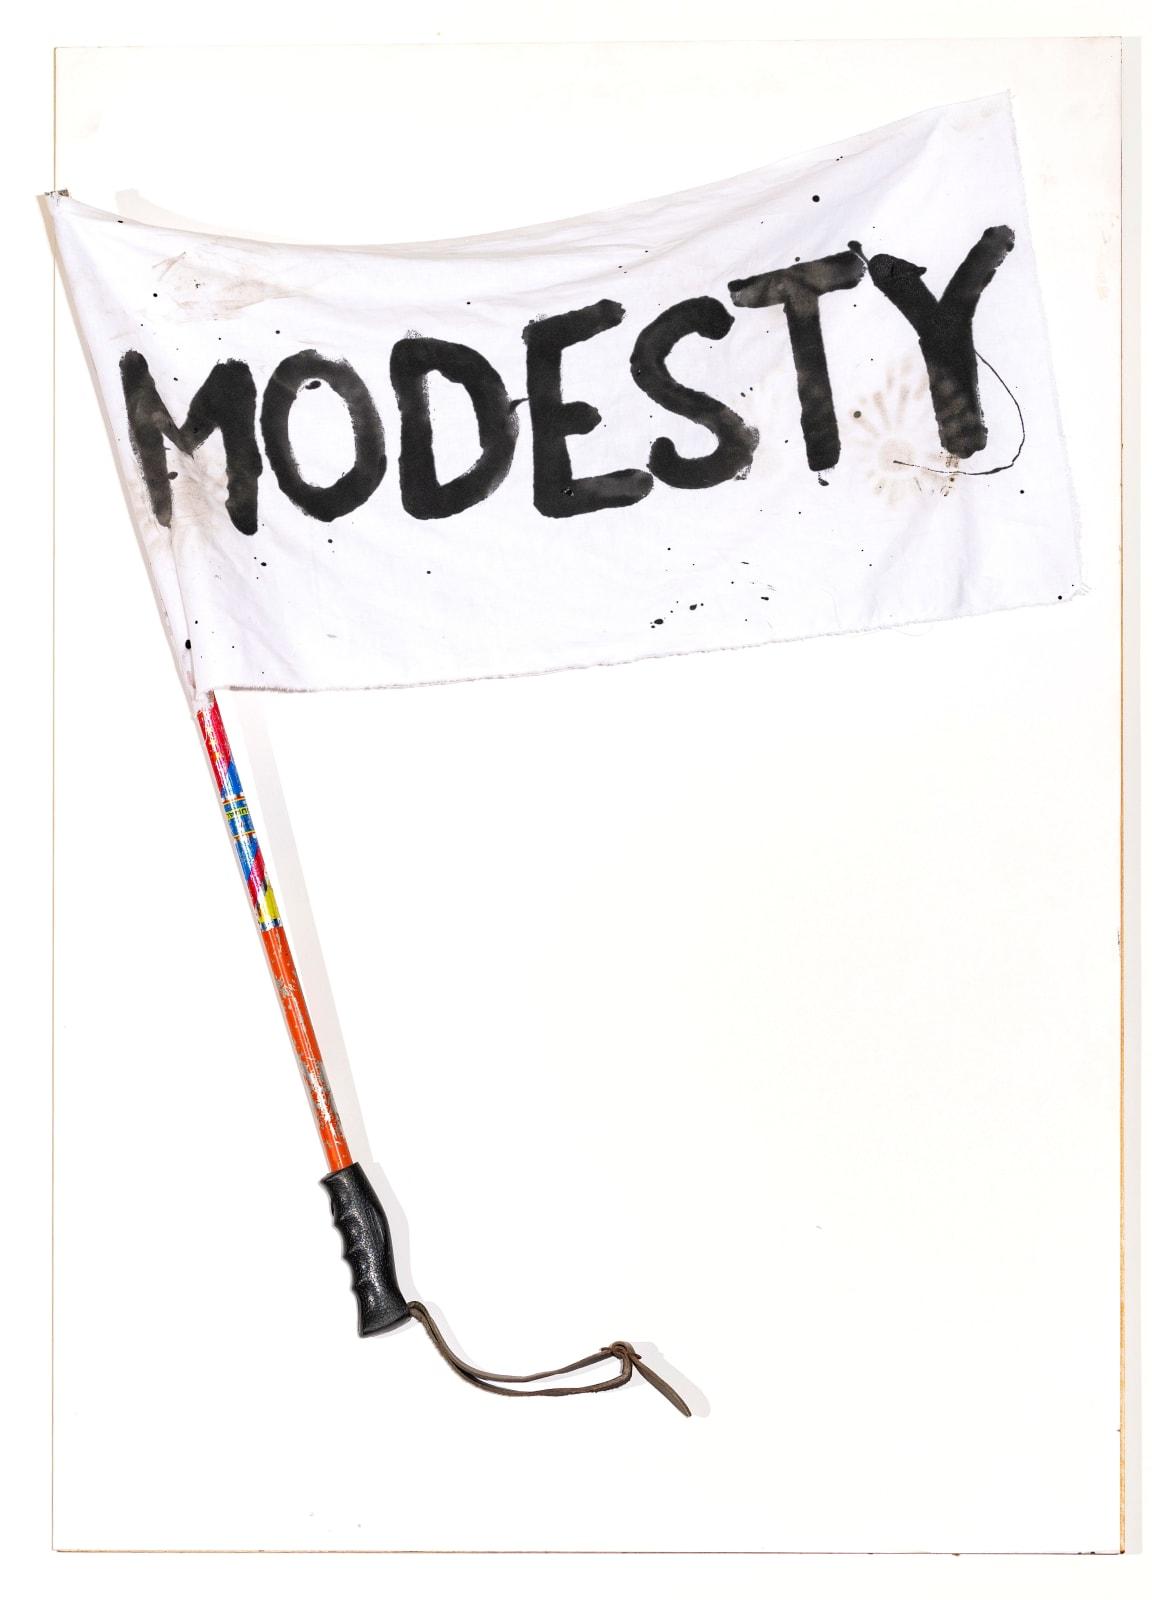 Krištof Kintera, Modesty, 2019